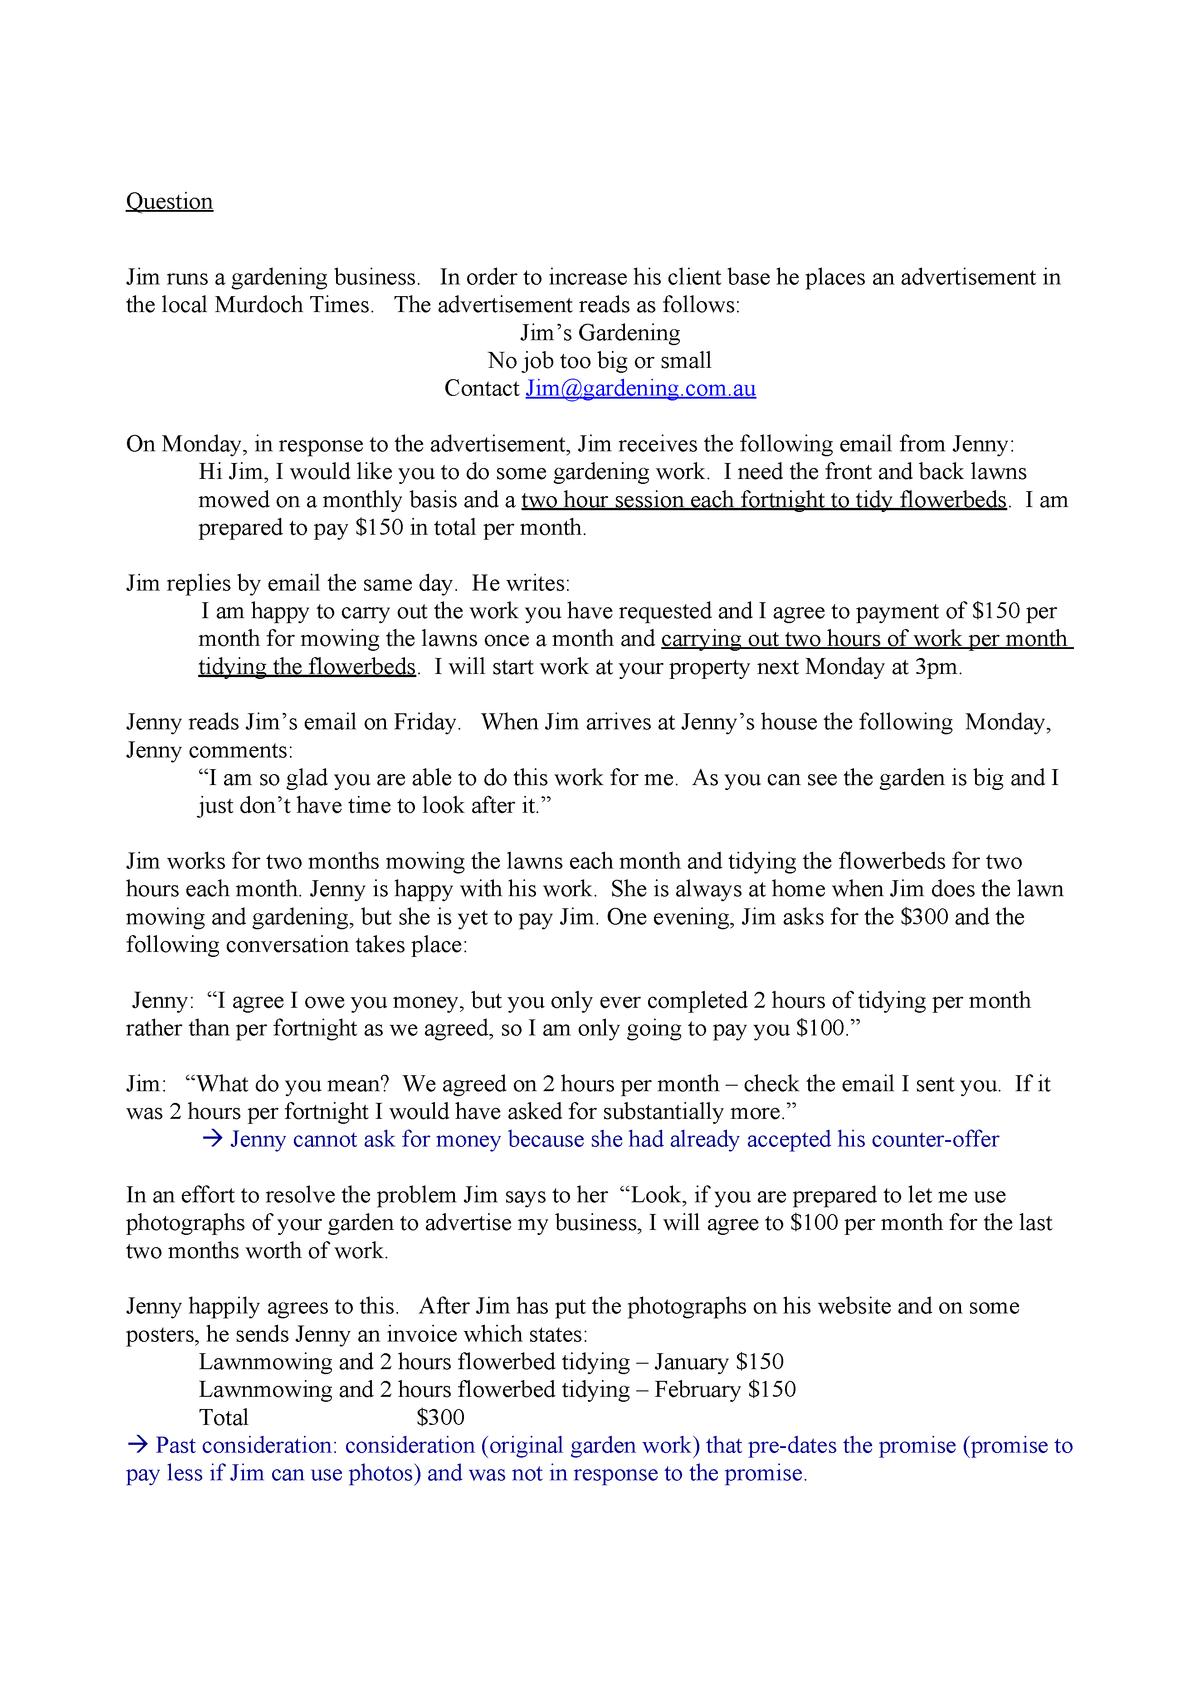 Jim's gardening - LLB260 Contract Law - Murdoch - StuDocu